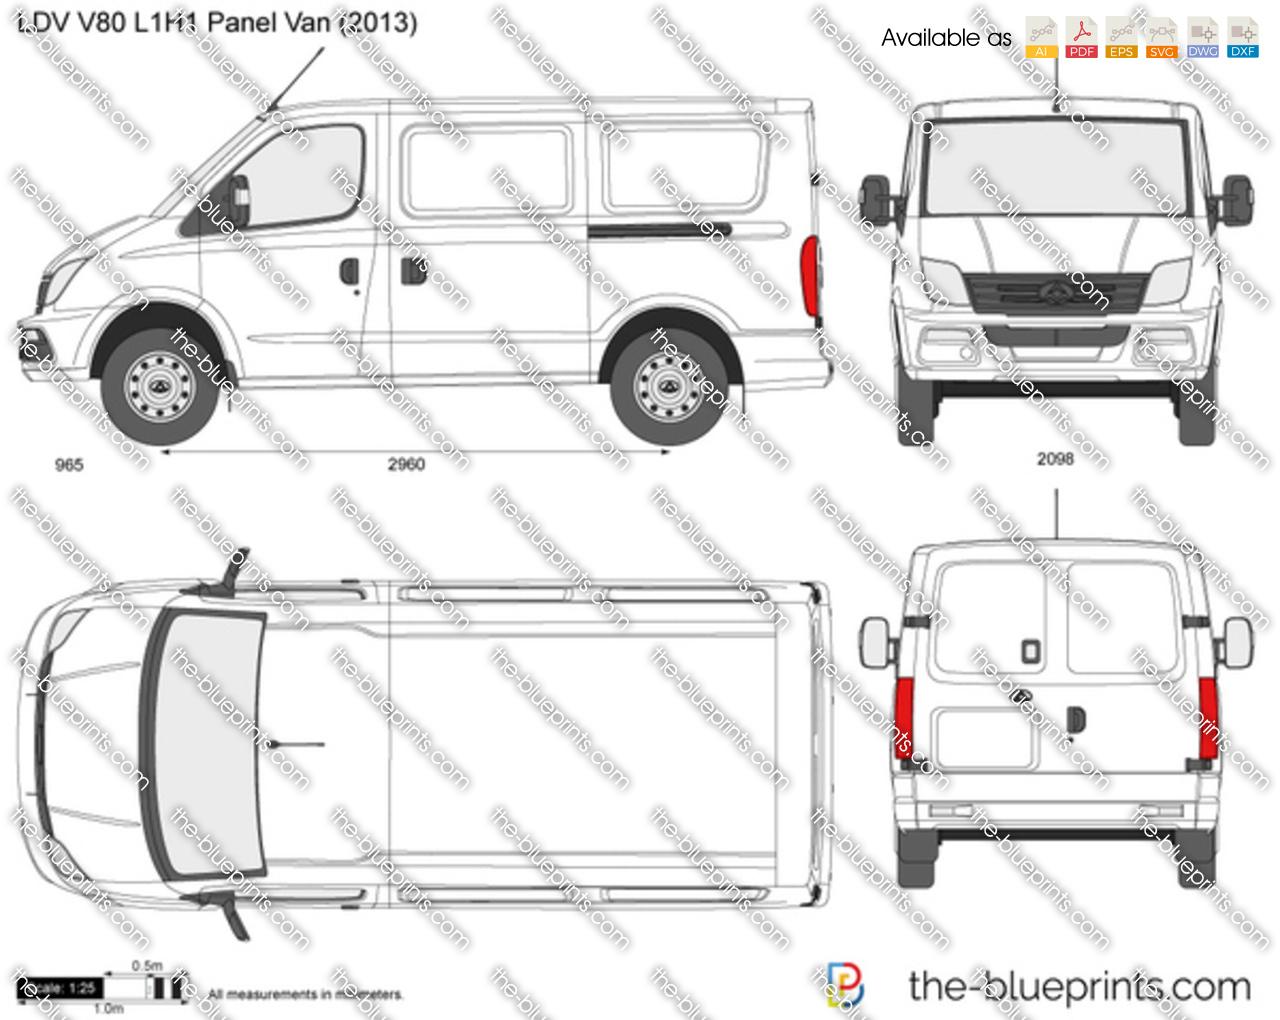 ldv v80 l1h1 panel van vector drawing